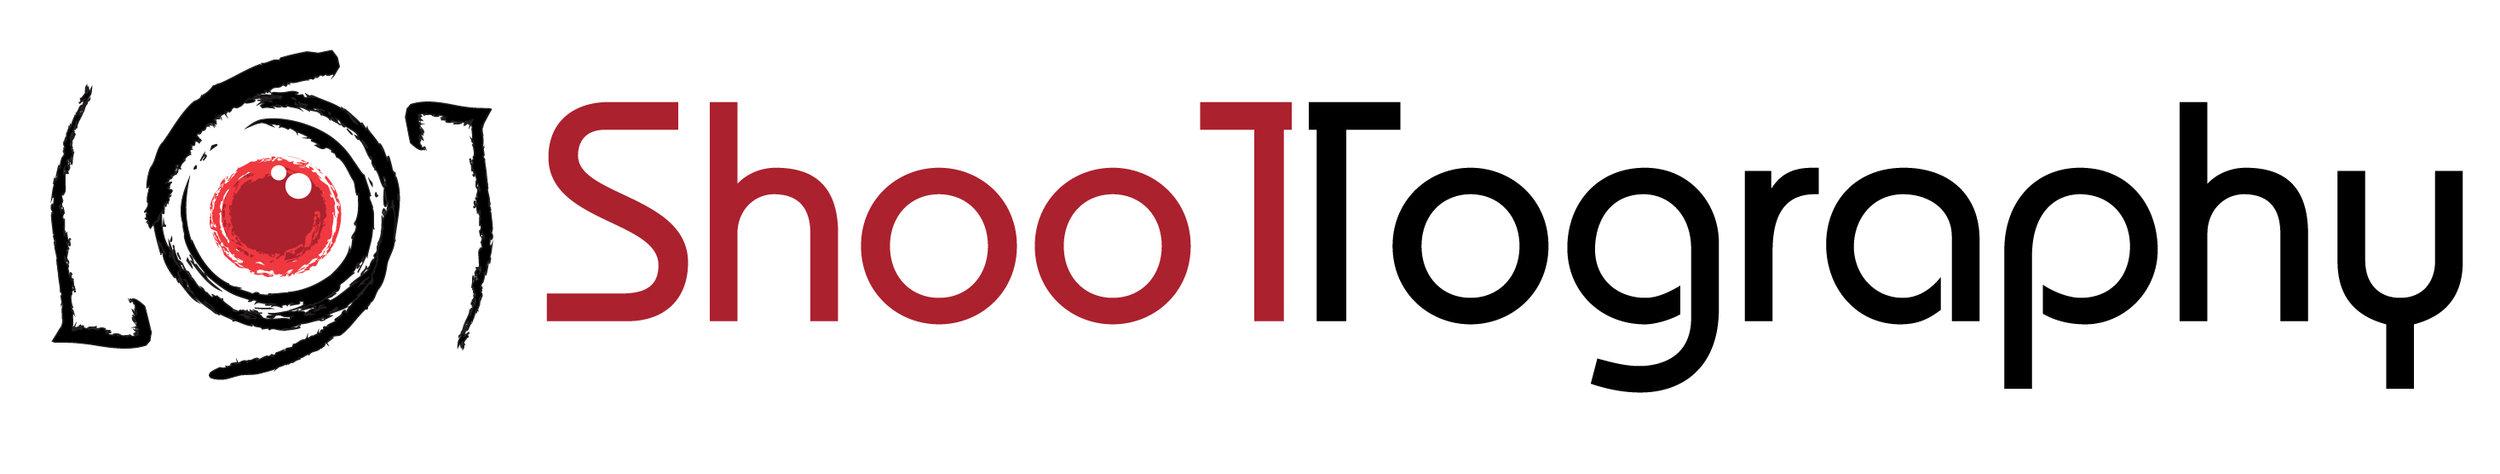 SHOOTTOGRAPHY=LOGO-01.jpg